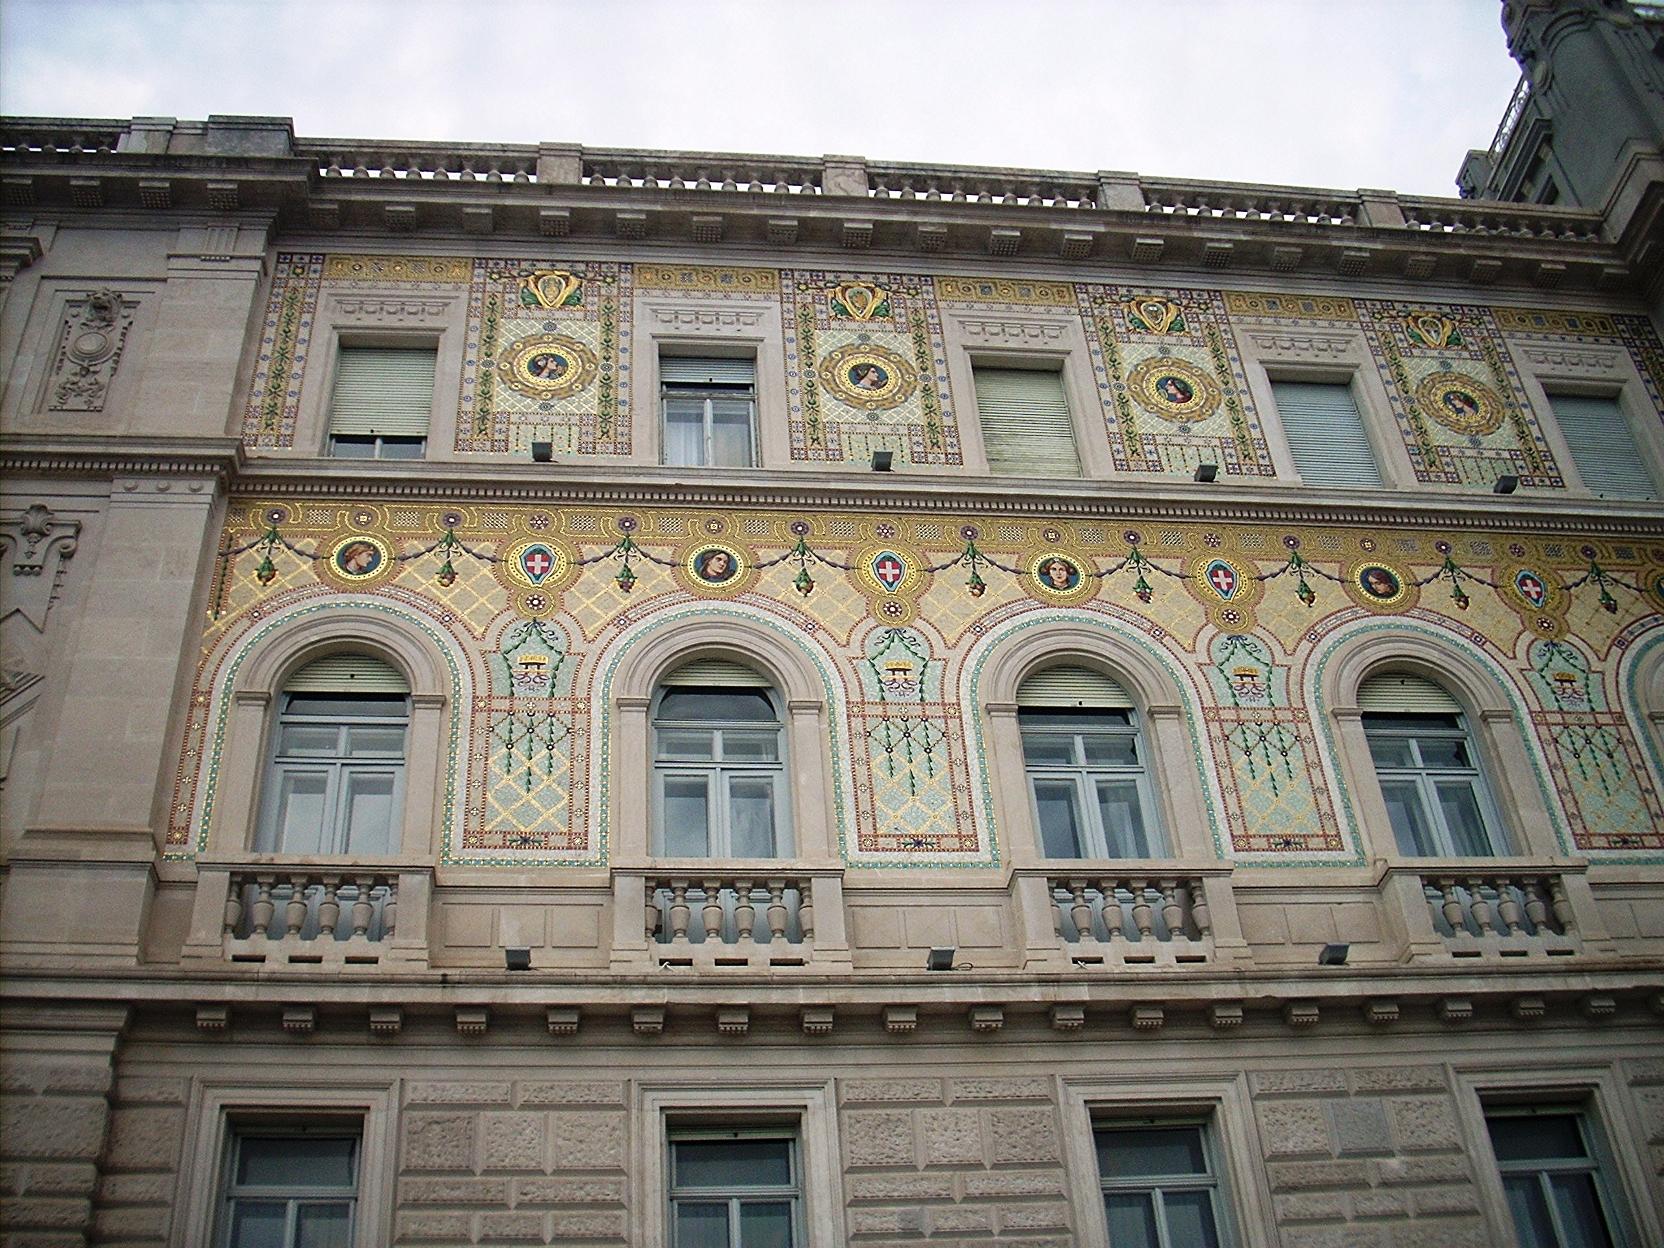 Piazza Unità d'Italia 13